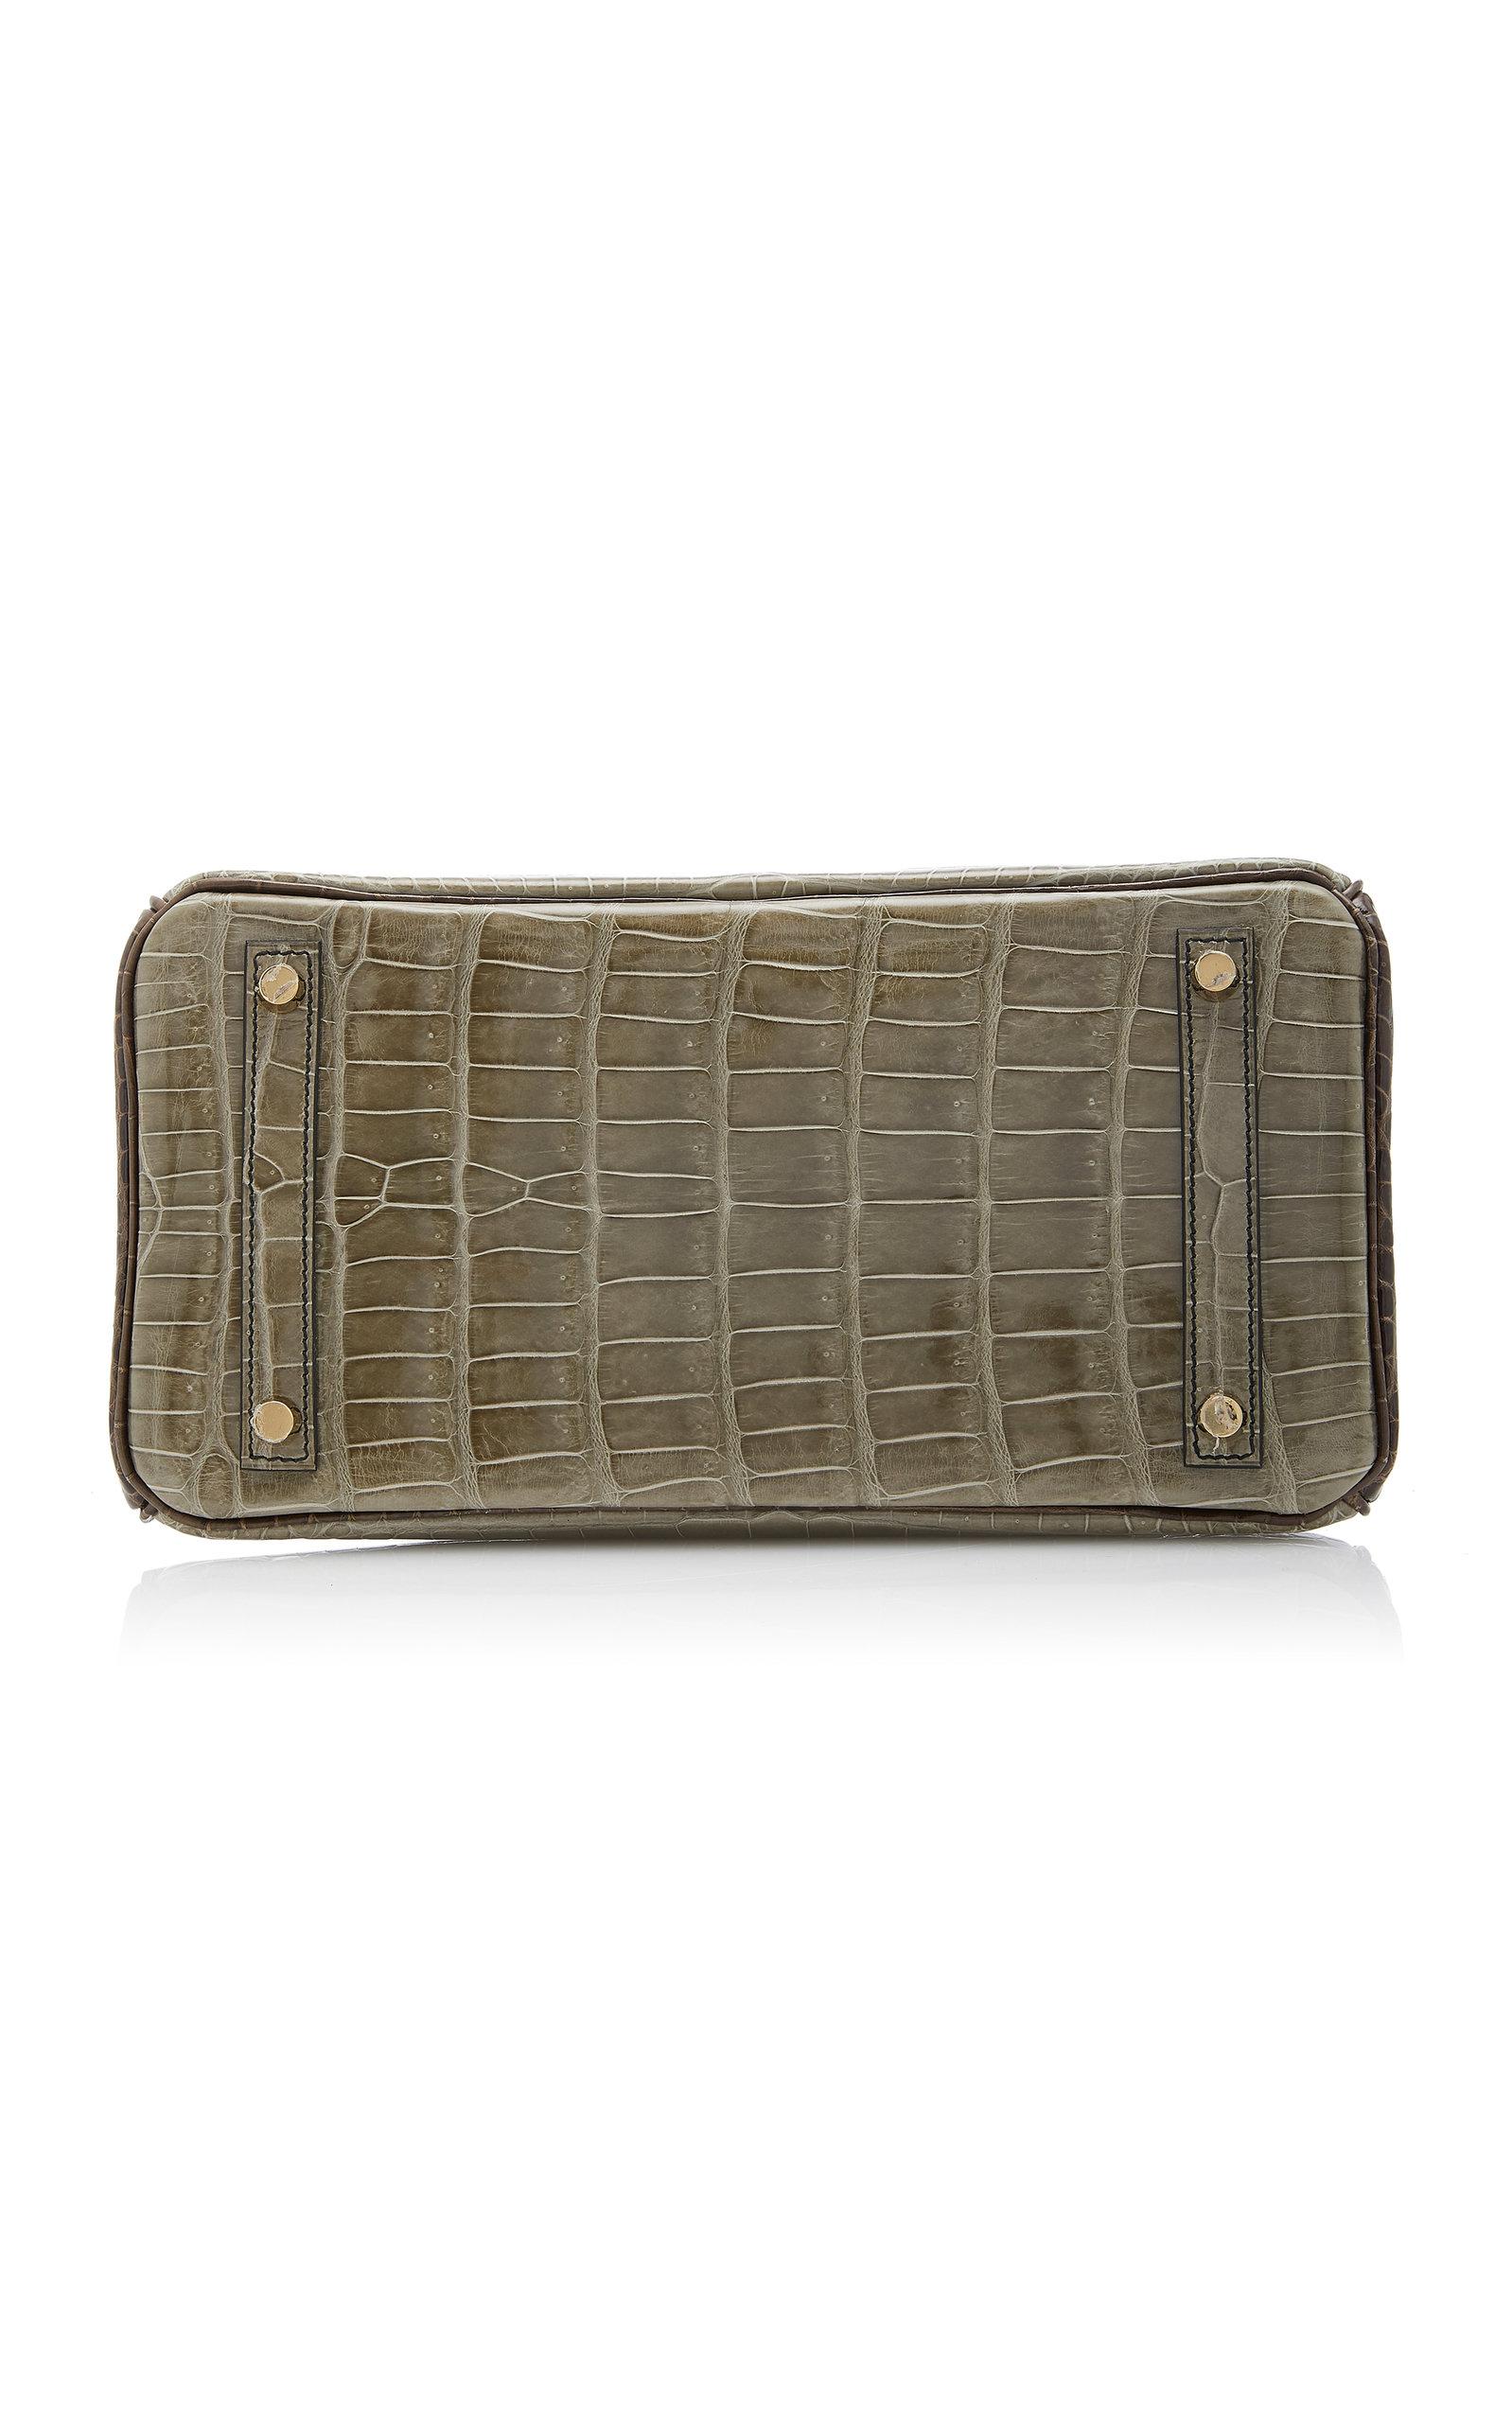 20af3e6d6161 Hermès Vintage by Heritage AuctionsHermès 30cm Gris Elephant and Gris  Tourterelle Crocodile Birkin. CLOSE. Loading. Loading